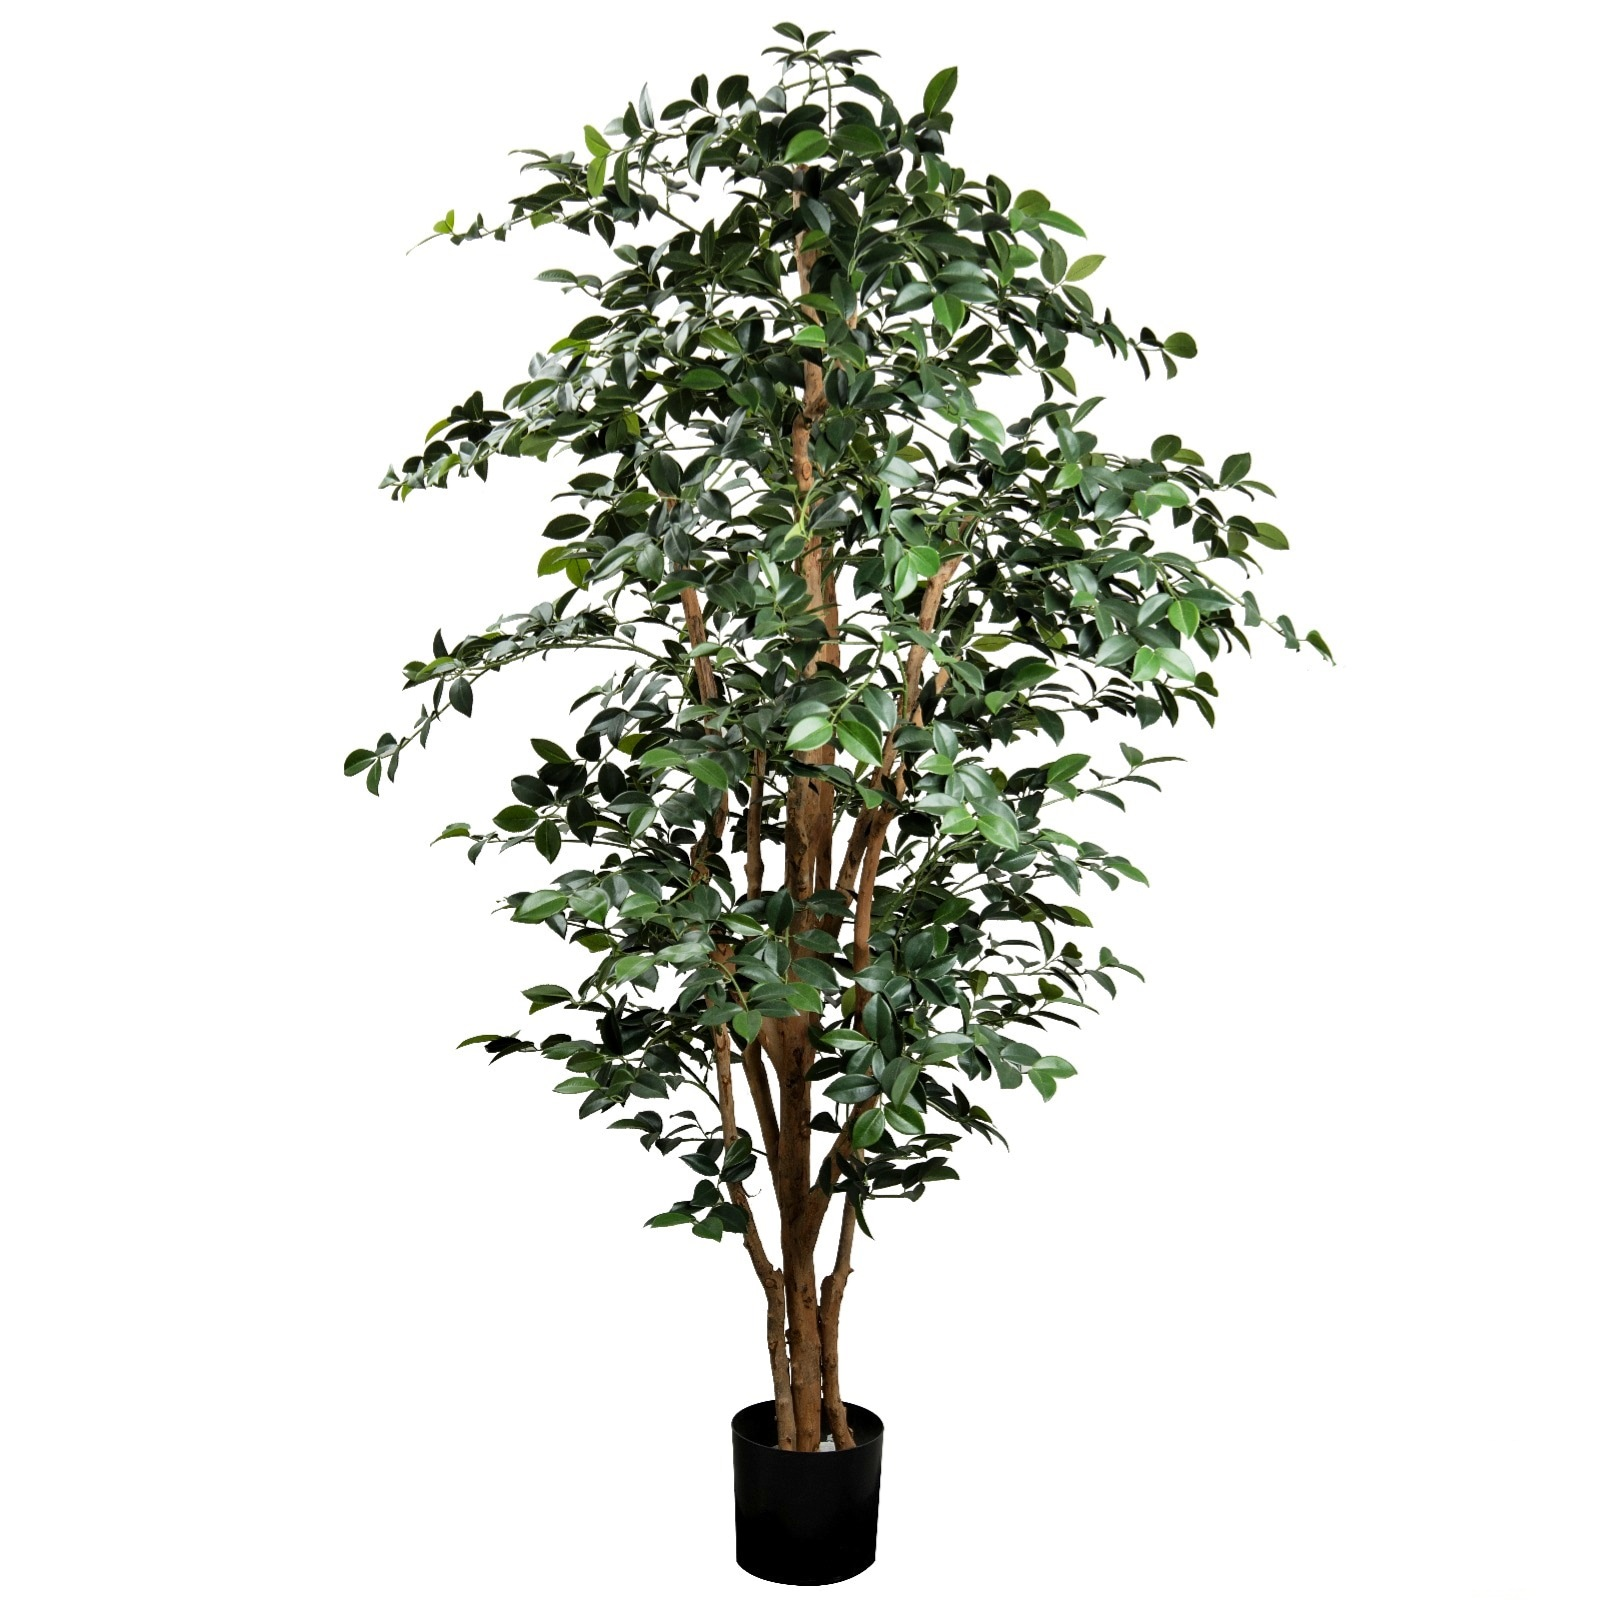 Sazanka Tree Large Artificial Plants